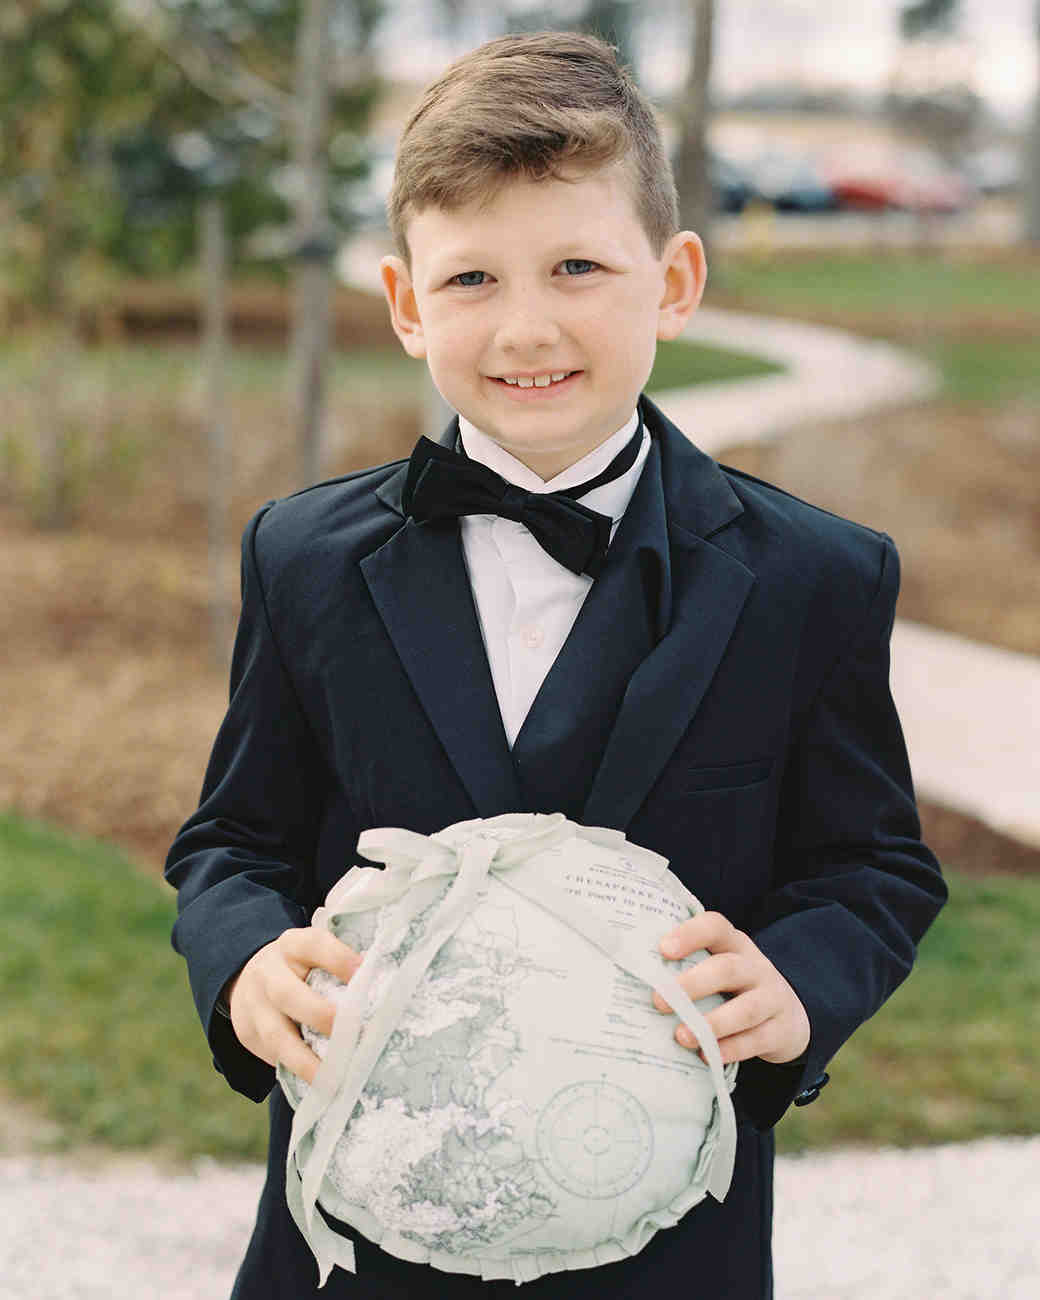 ring bearer holding map pattern pillow at wedding